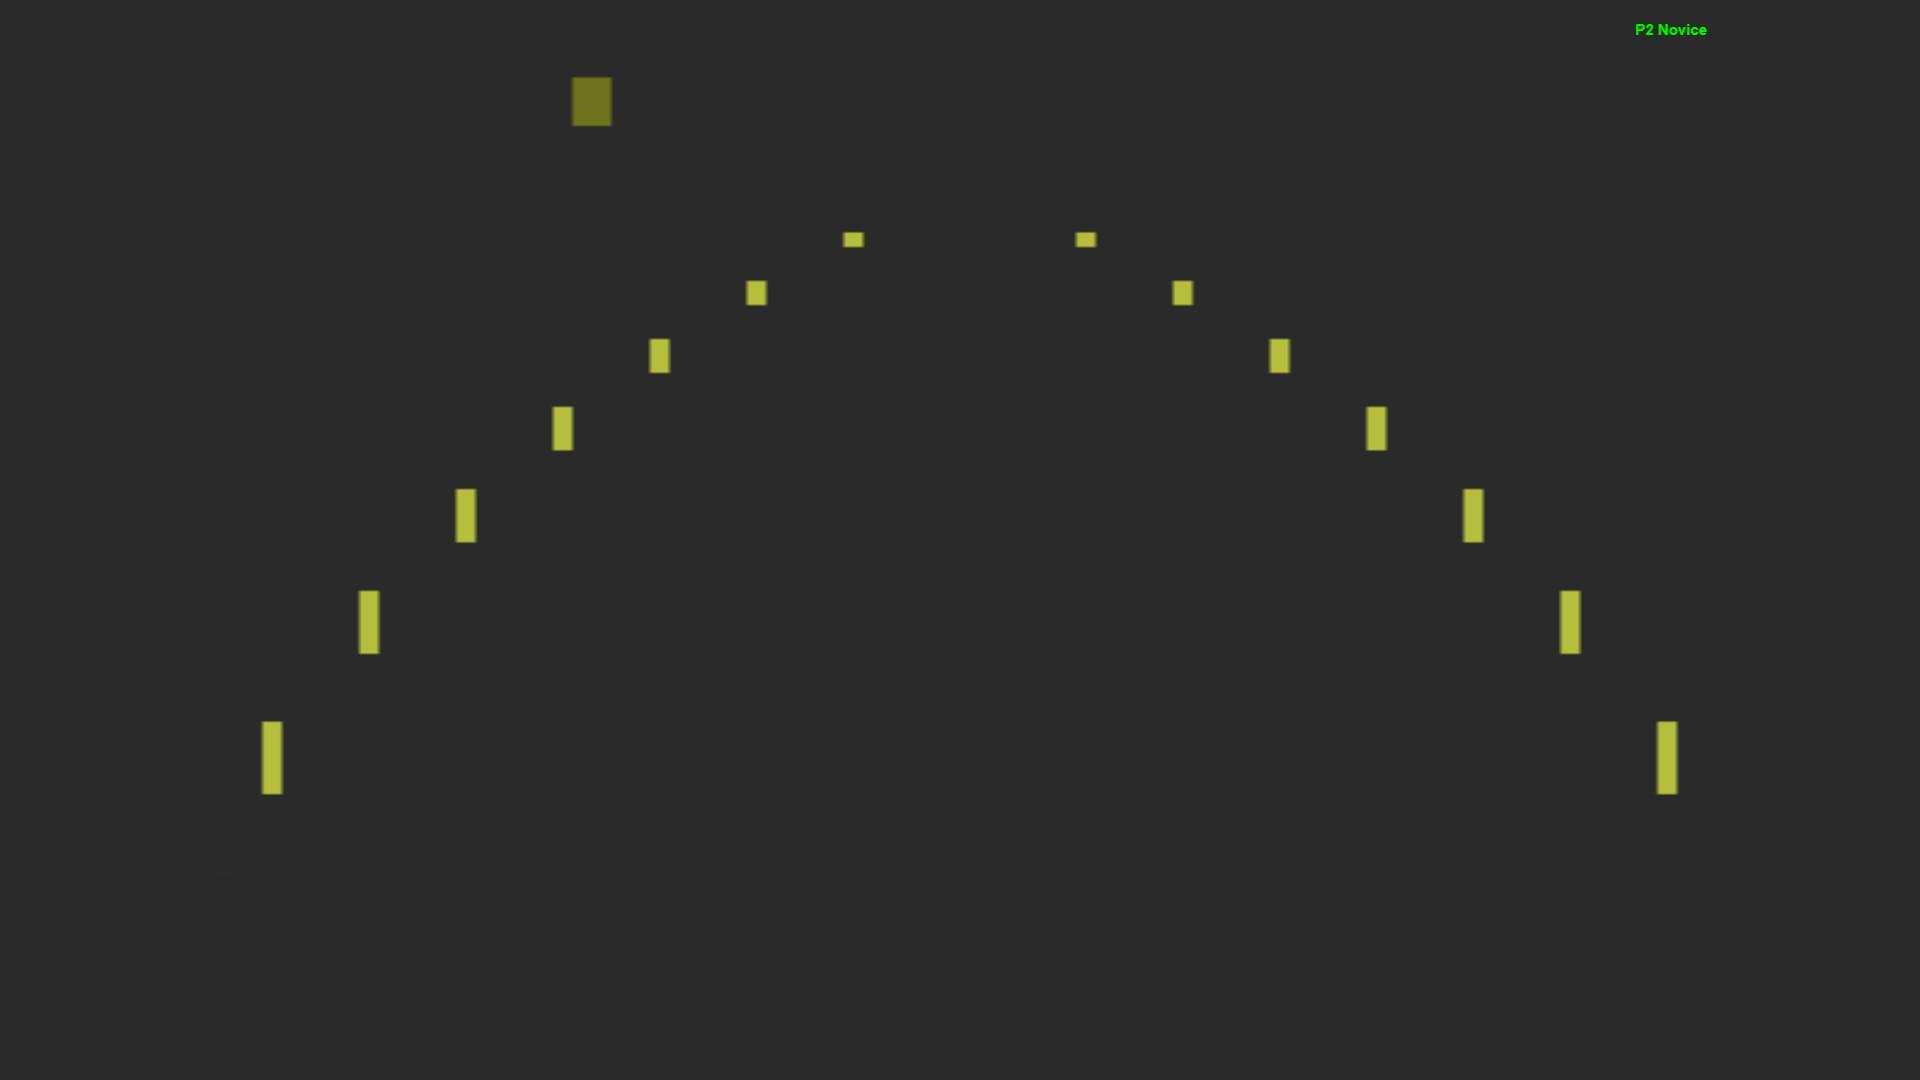 AkinNahtanoj: Night Driver (Atari 2600 Emulated Novice/B Mode) 35 points on 2020-10-13 16:17:41